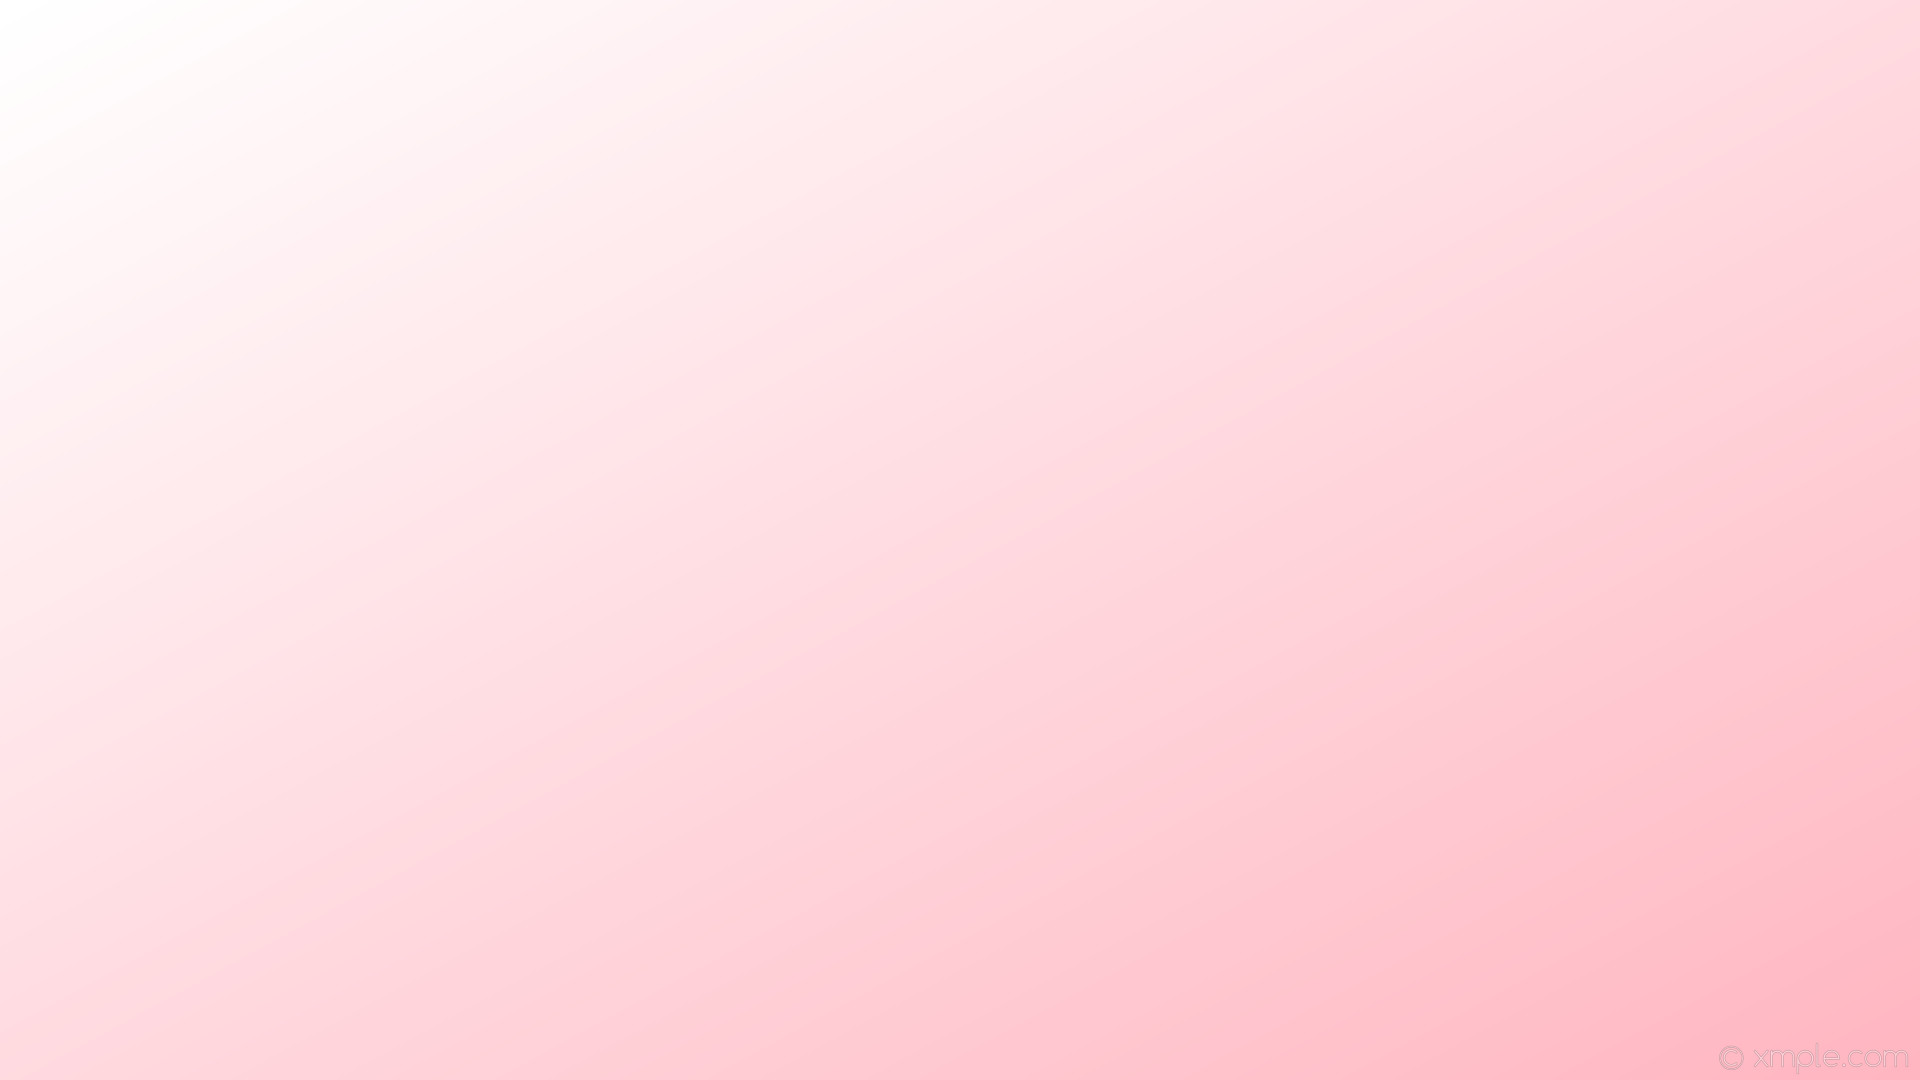 wallpaper white pink gradient linear light pink #ffffff #ffb6c1 150°